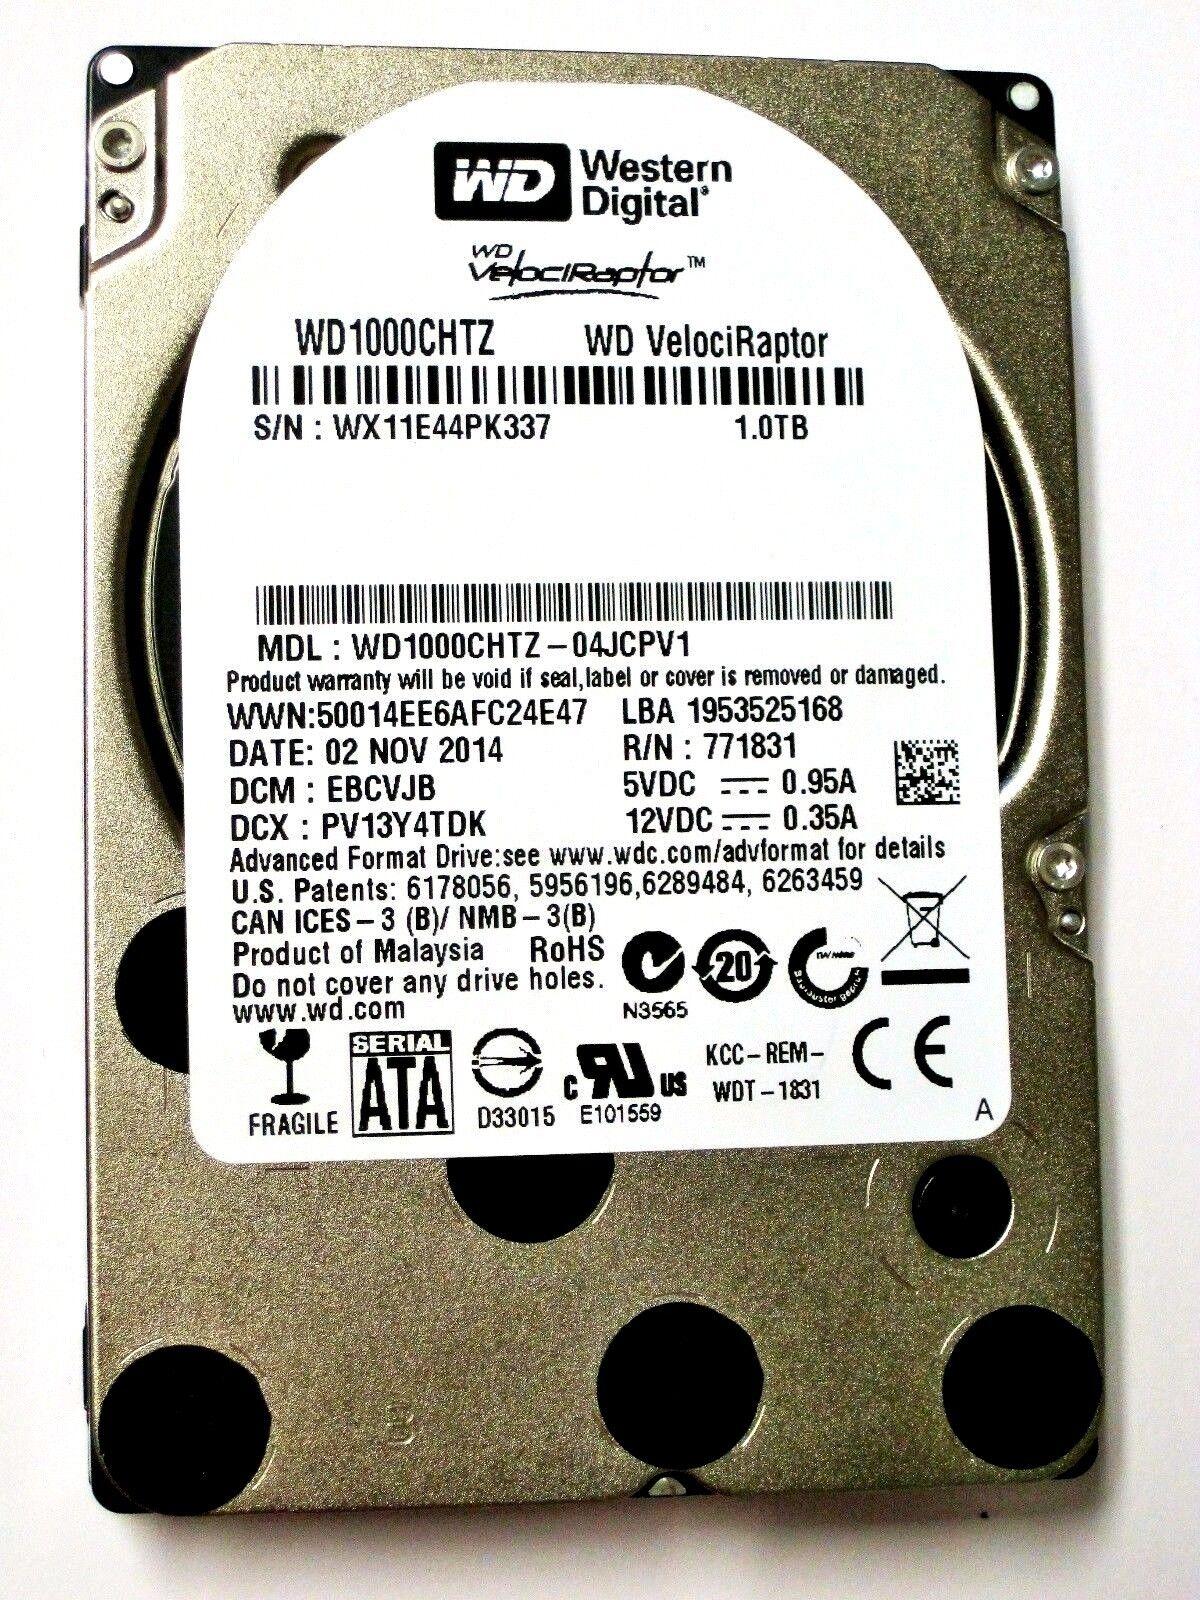 "Western Digital WD VelociRaptor WD1000CHTZ 1TB  SATA 10K RPM SFF 2.5/"" Drive MY"